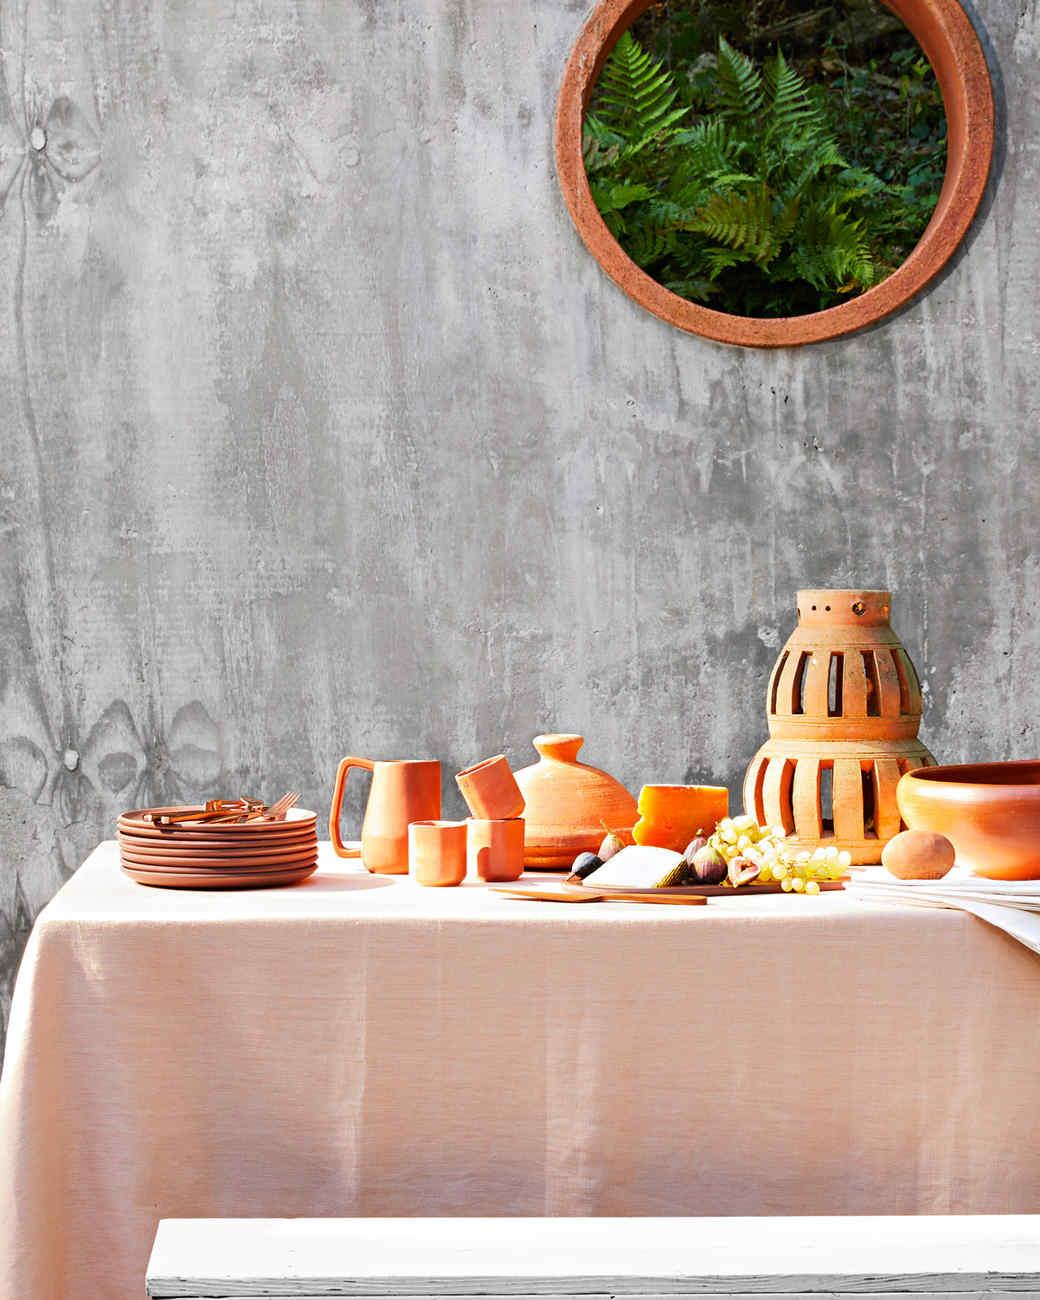 terracotta tableware